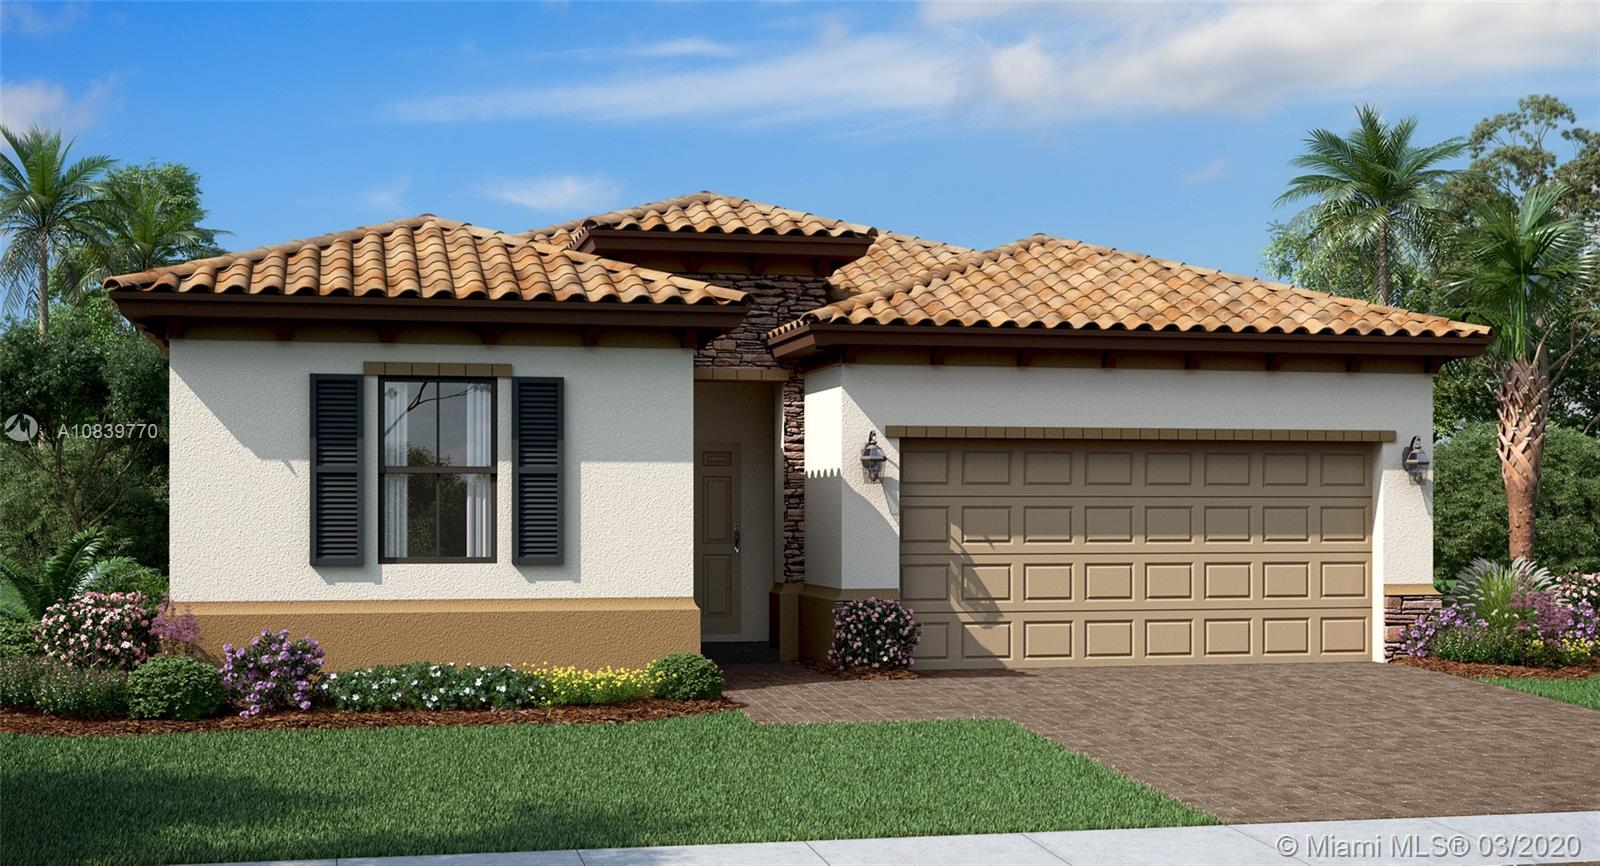 165 SE 27 TERR, Homestead, Florida 33033, 4 Bedrooms Bedrooms, ,3 BathroomsBathrooms,Residential,For Sale,165 SE 27 TERR,A10839770